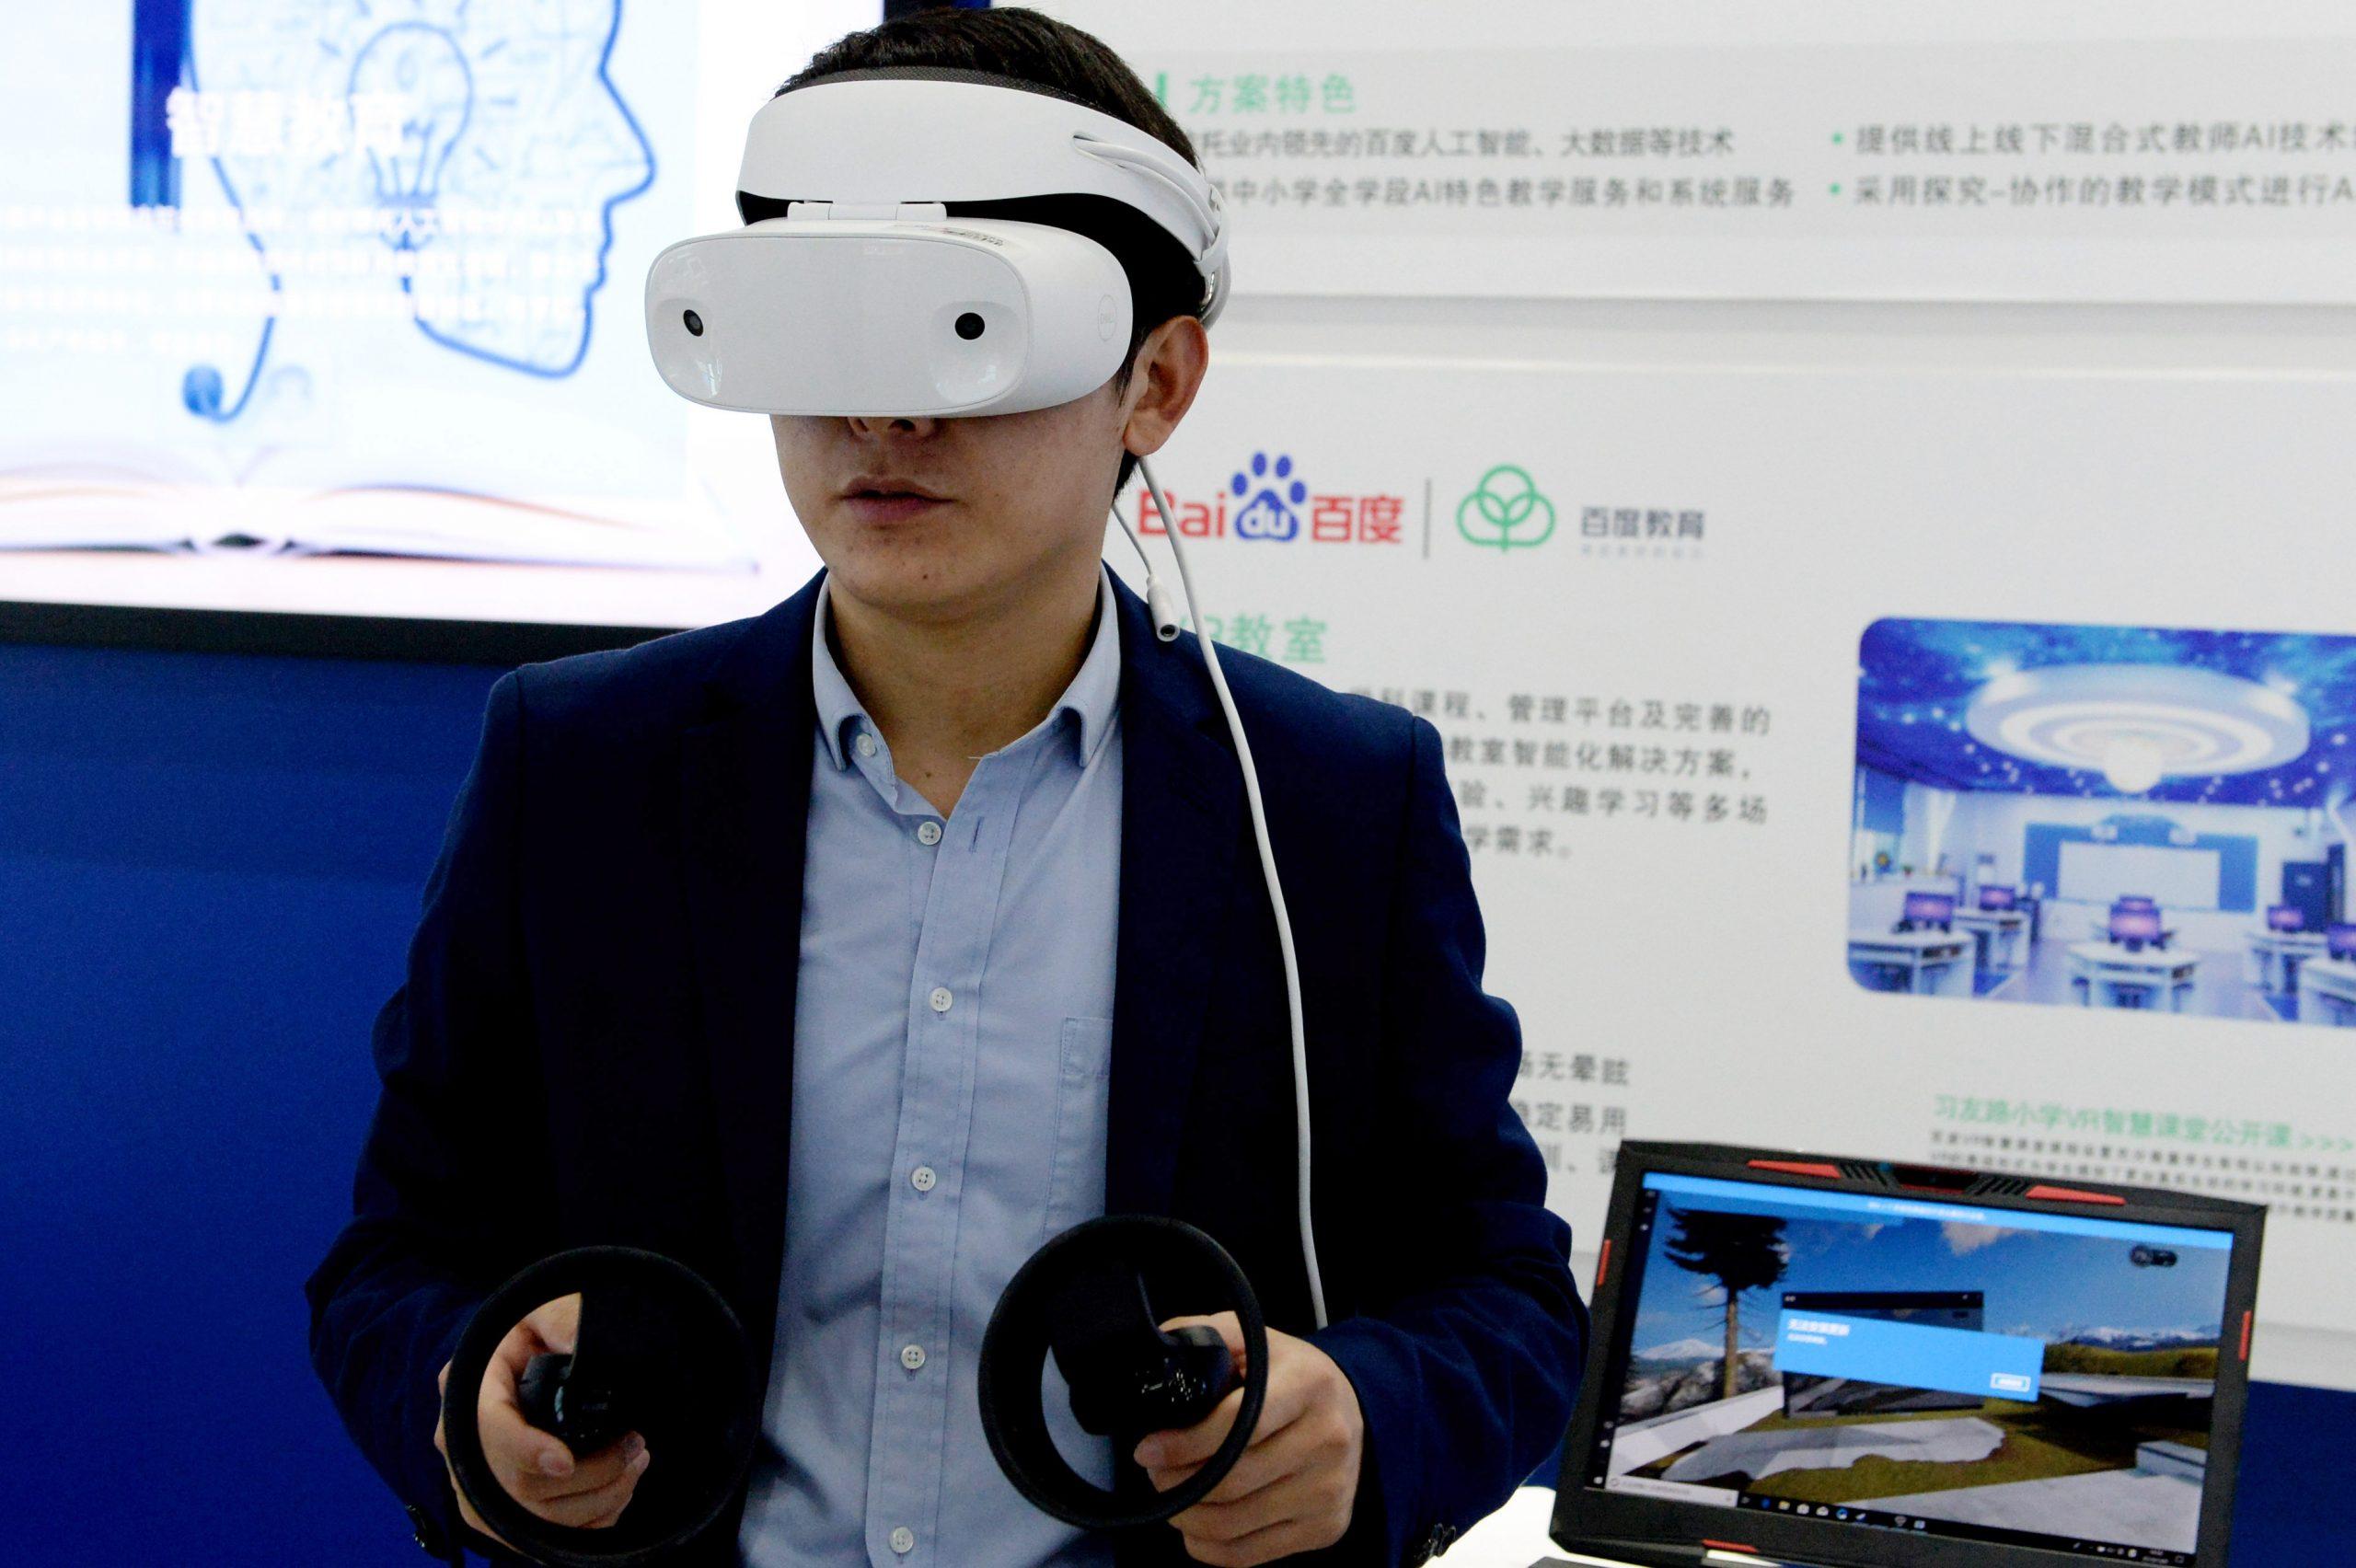 Se inaugura Cumbre de Inteligencia Artificial sobre profundización de cooperación en economía digital China-ASEAN